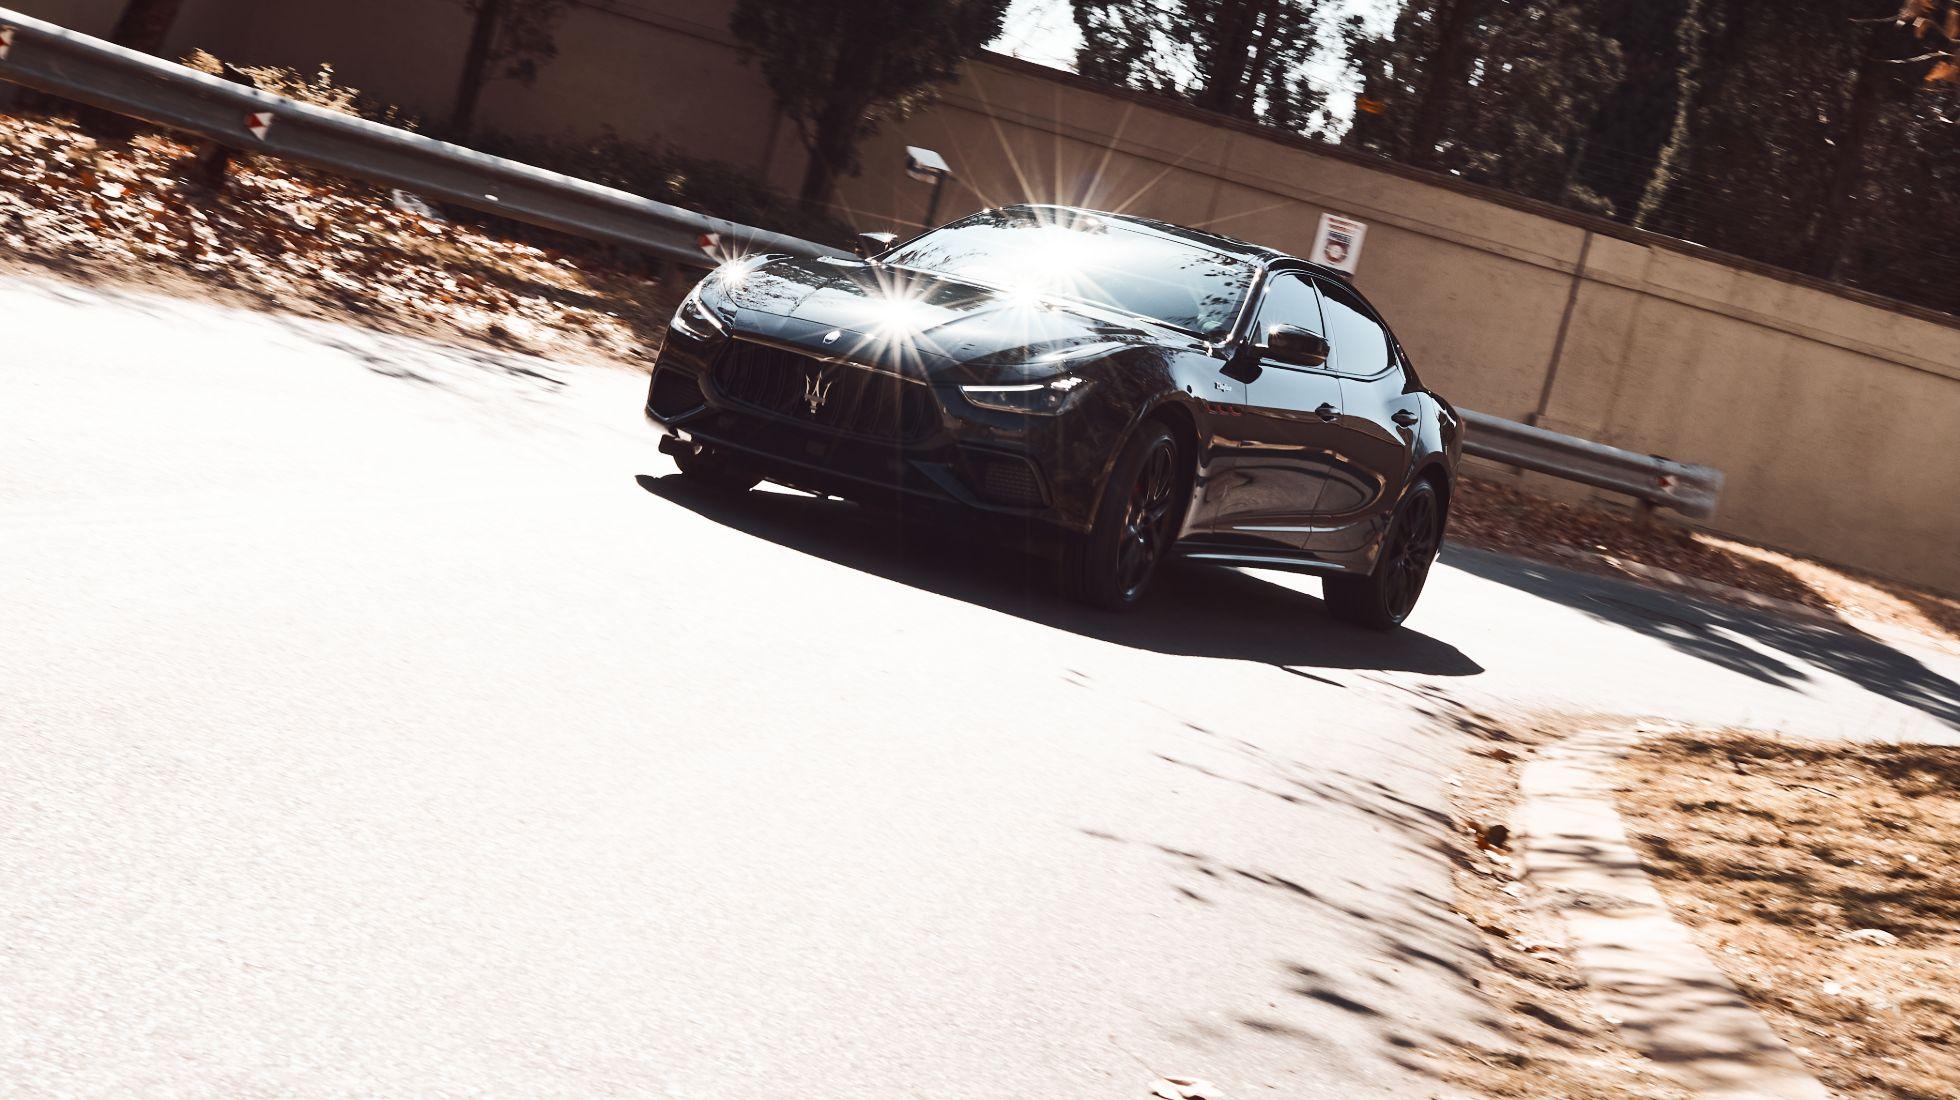 FIRST DRIVE: Maserati Ghibli Trofeo